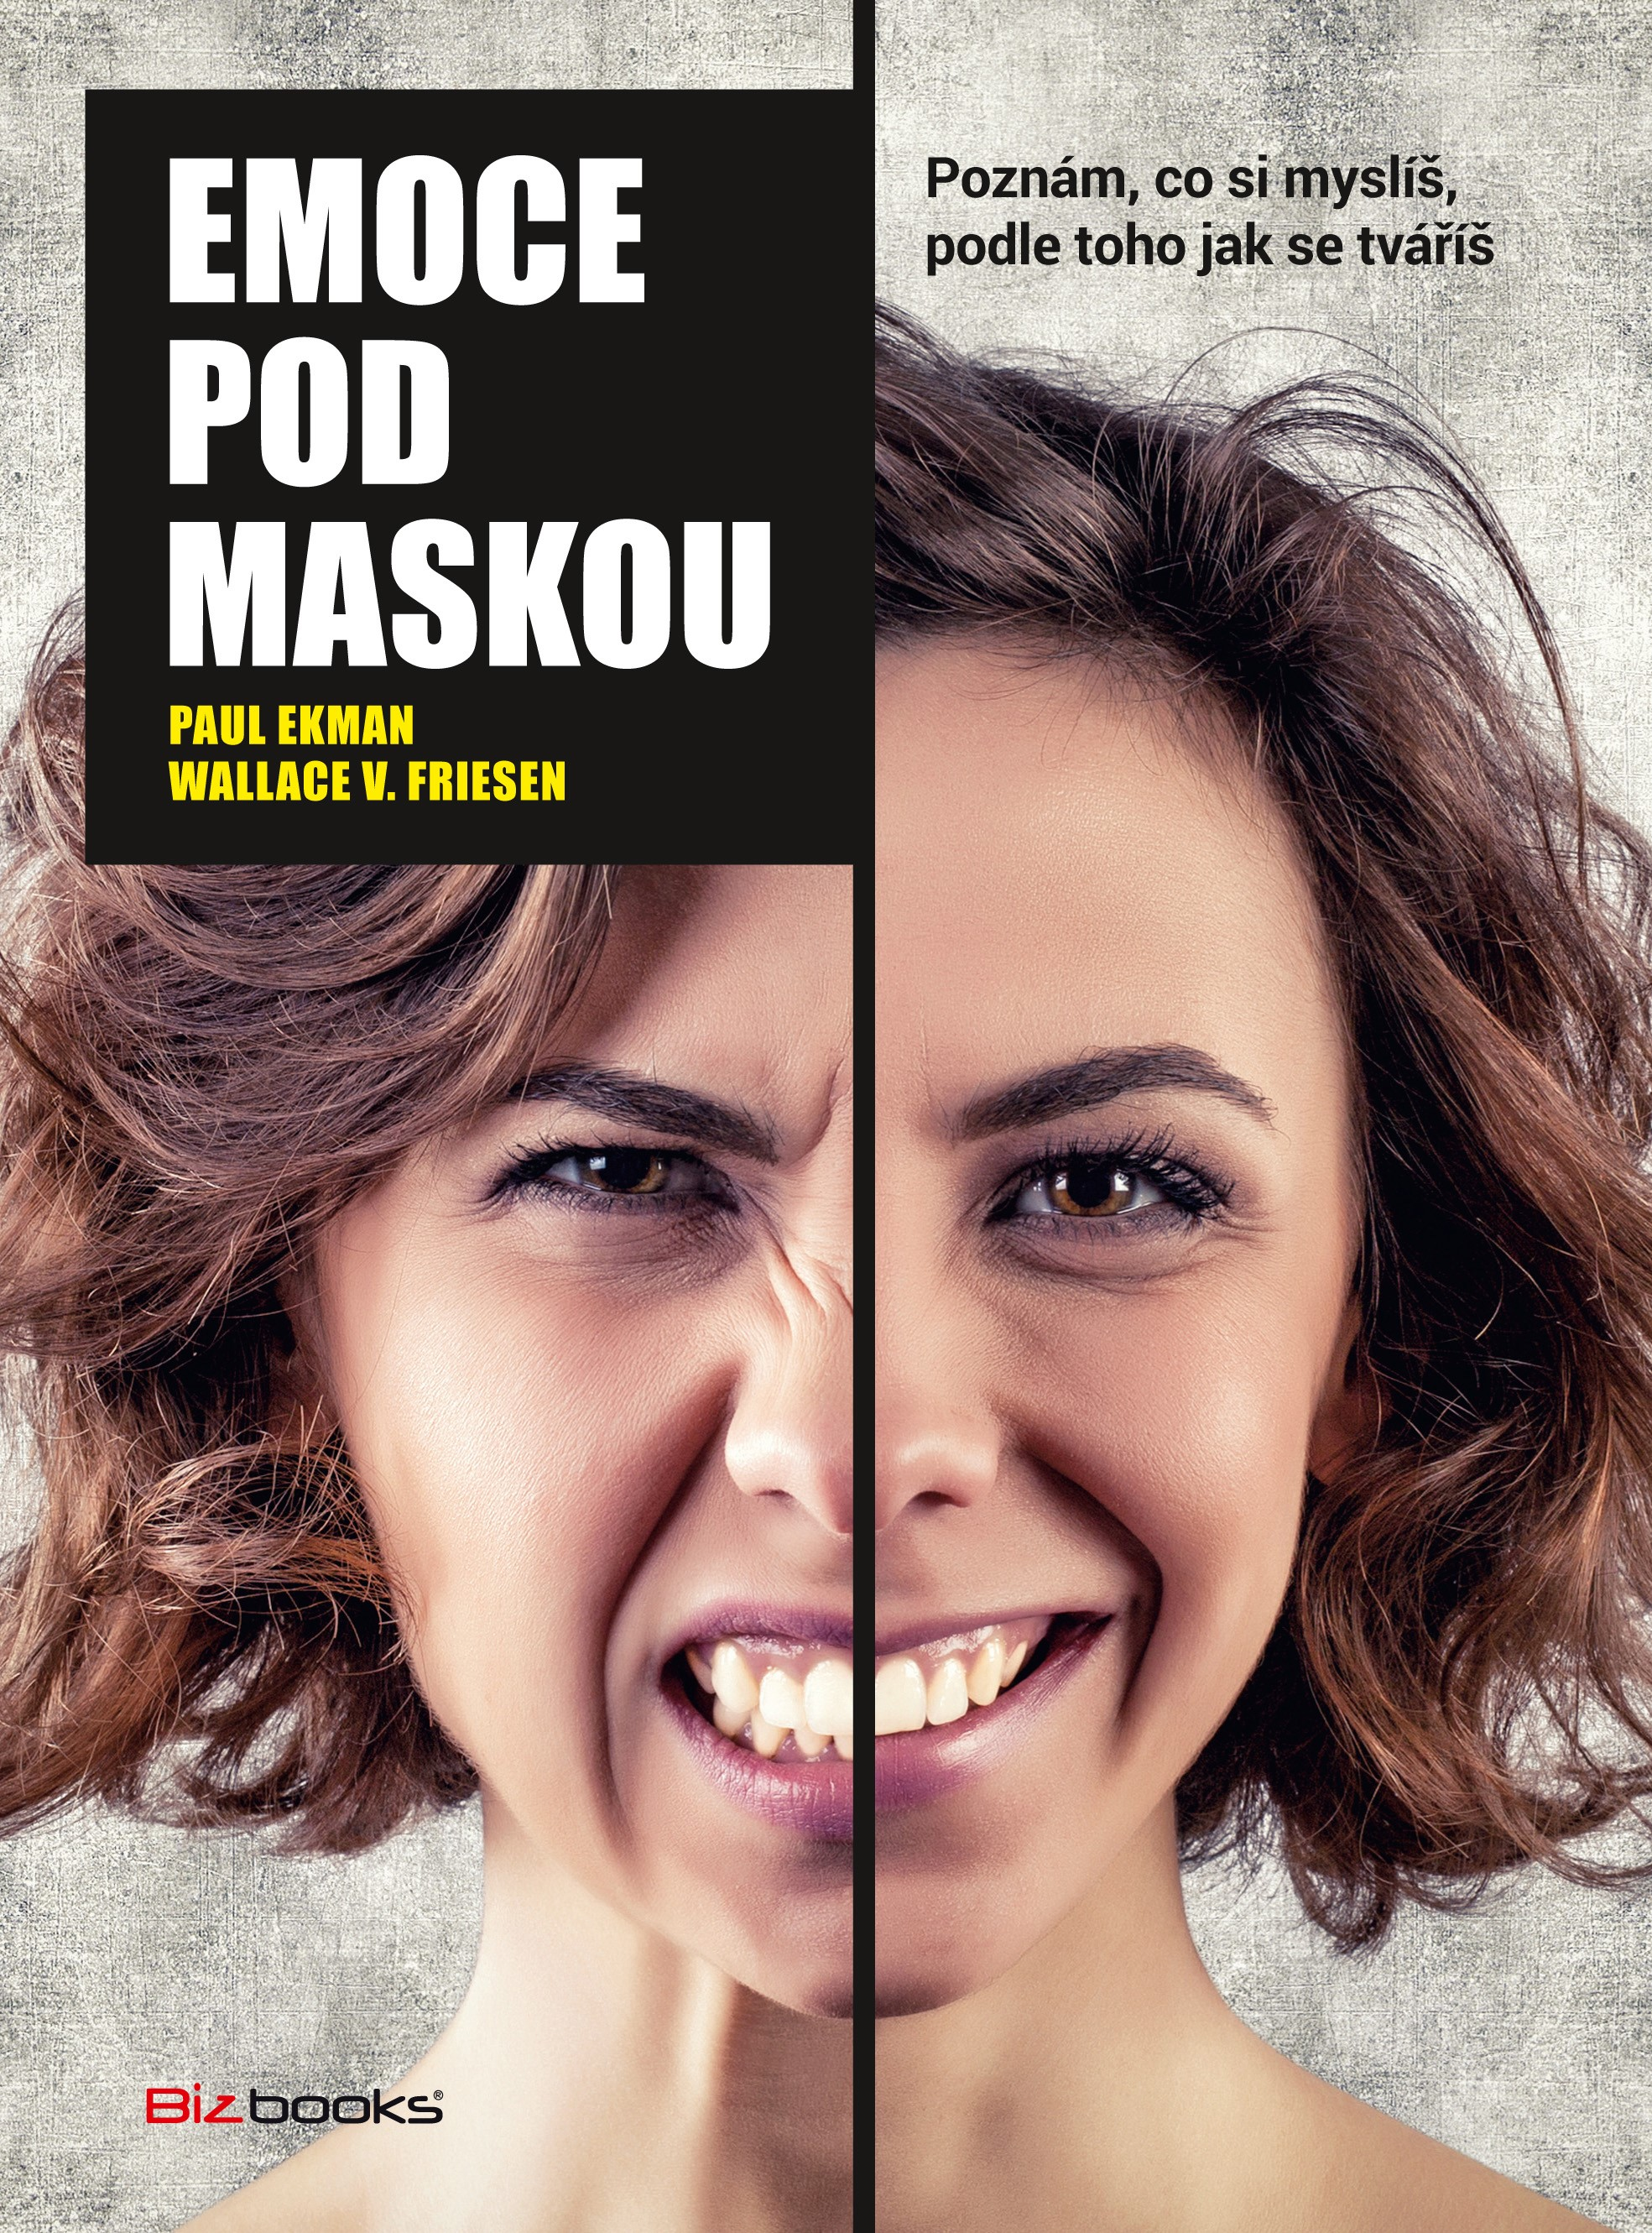 Emoce pod maskou | Paul Ekman, Wallace Friesen